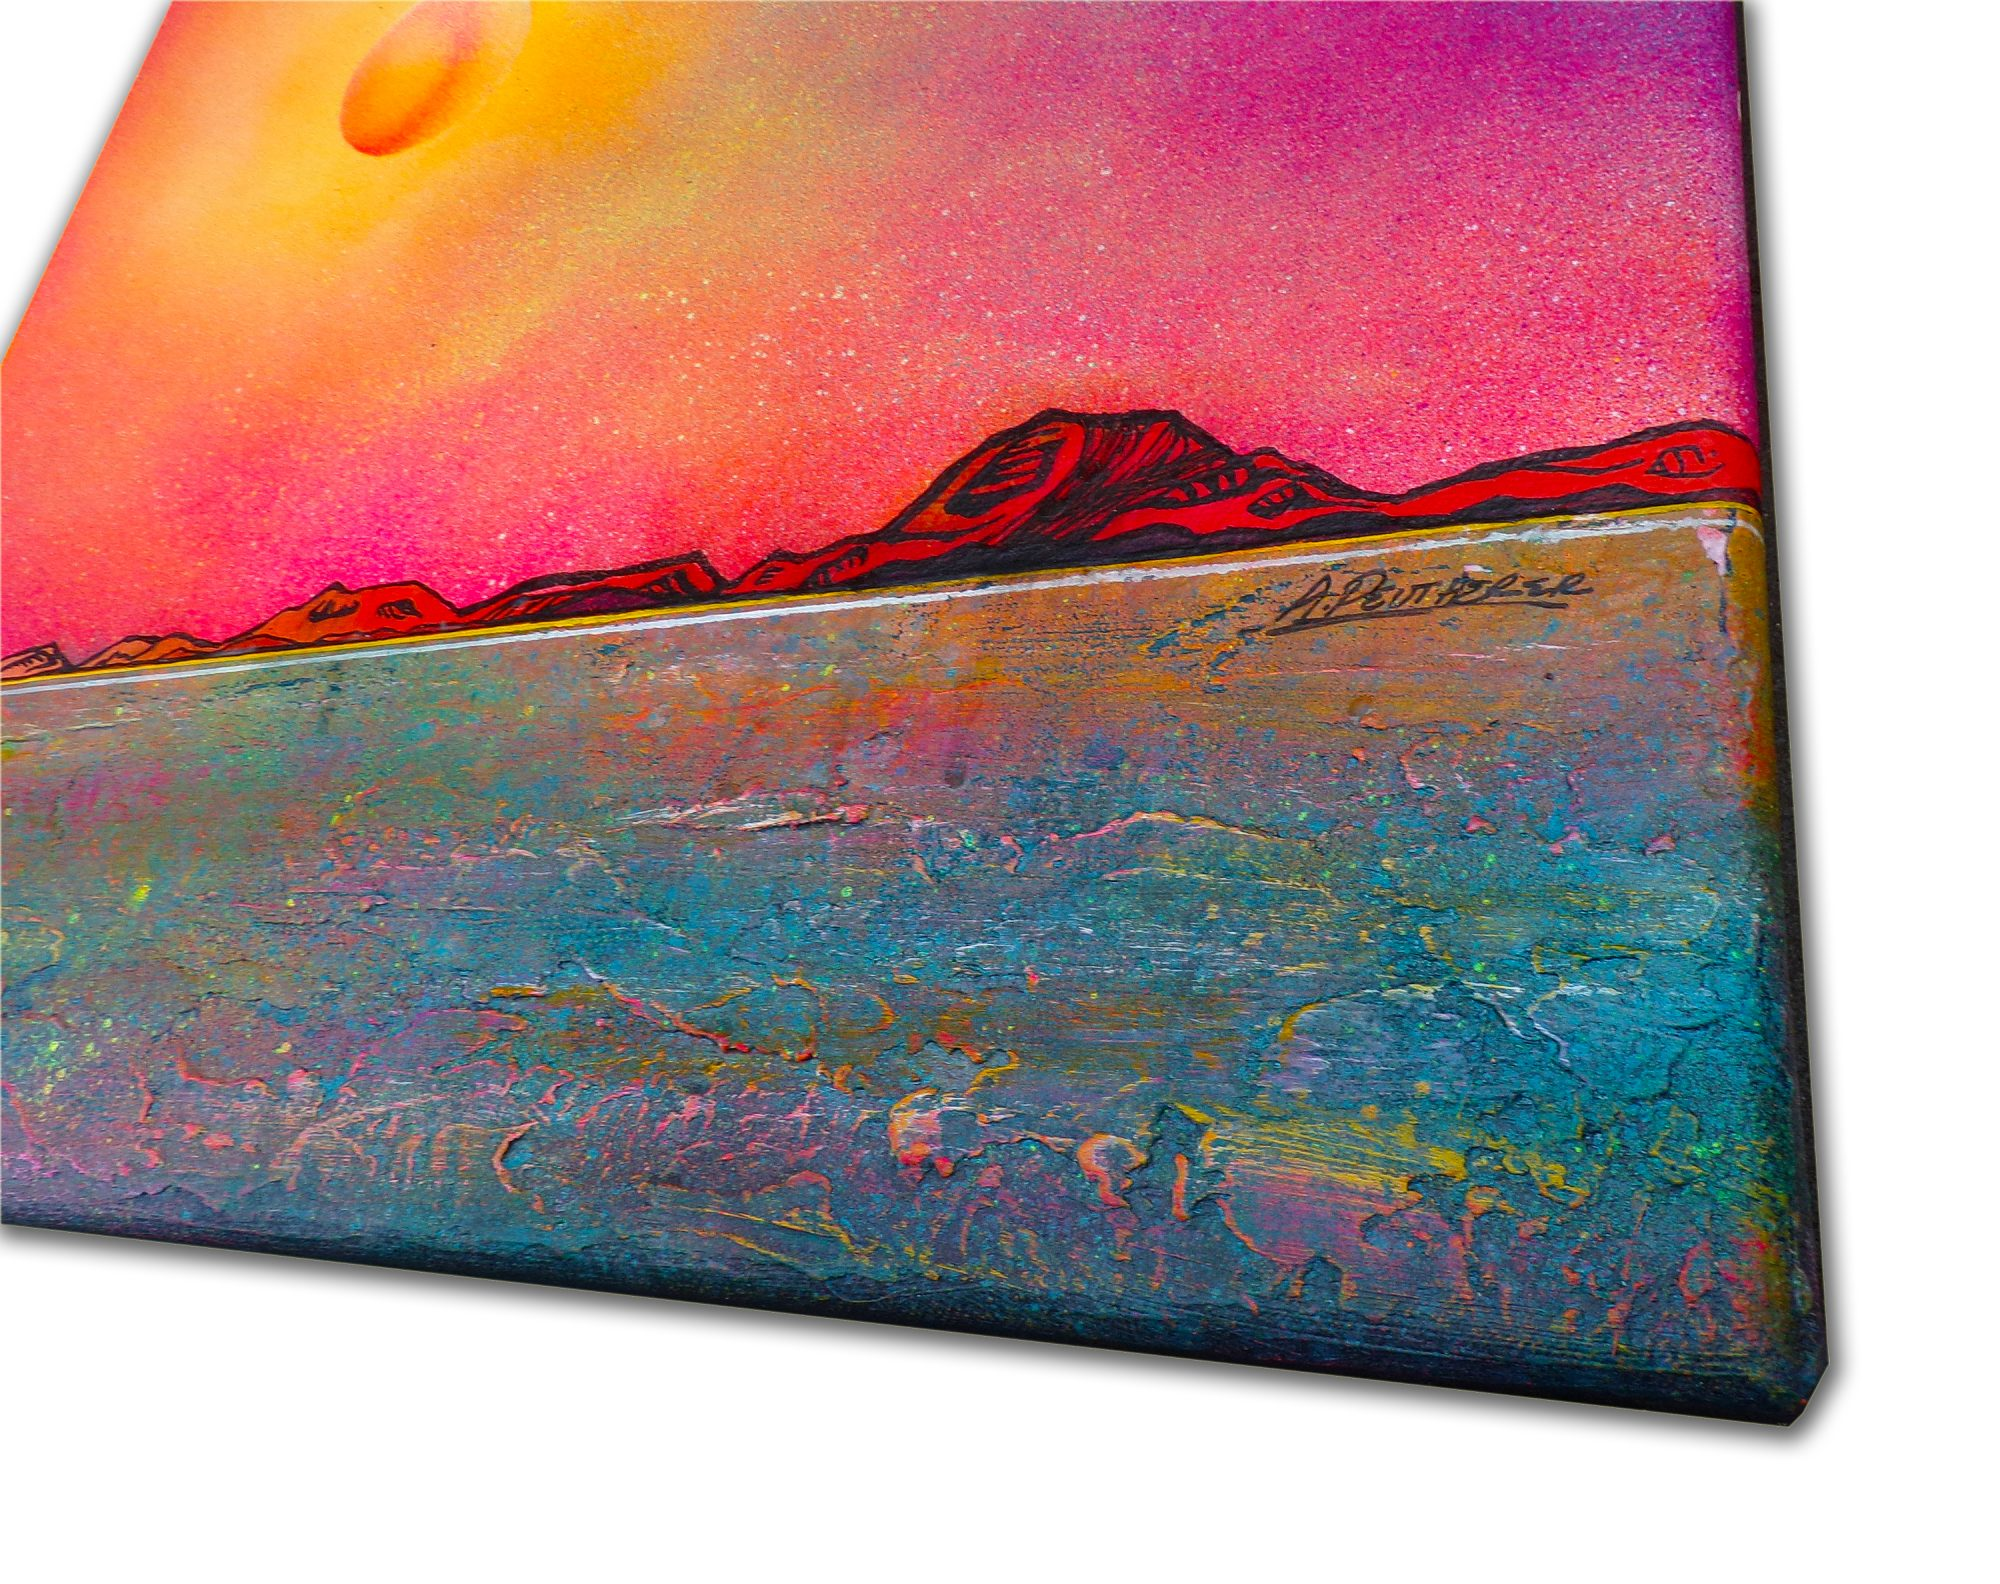 Ben More, Isle Of Mull, Hebrides, Scotland - original Painting Canvas & Art Prints - 3D Detail View